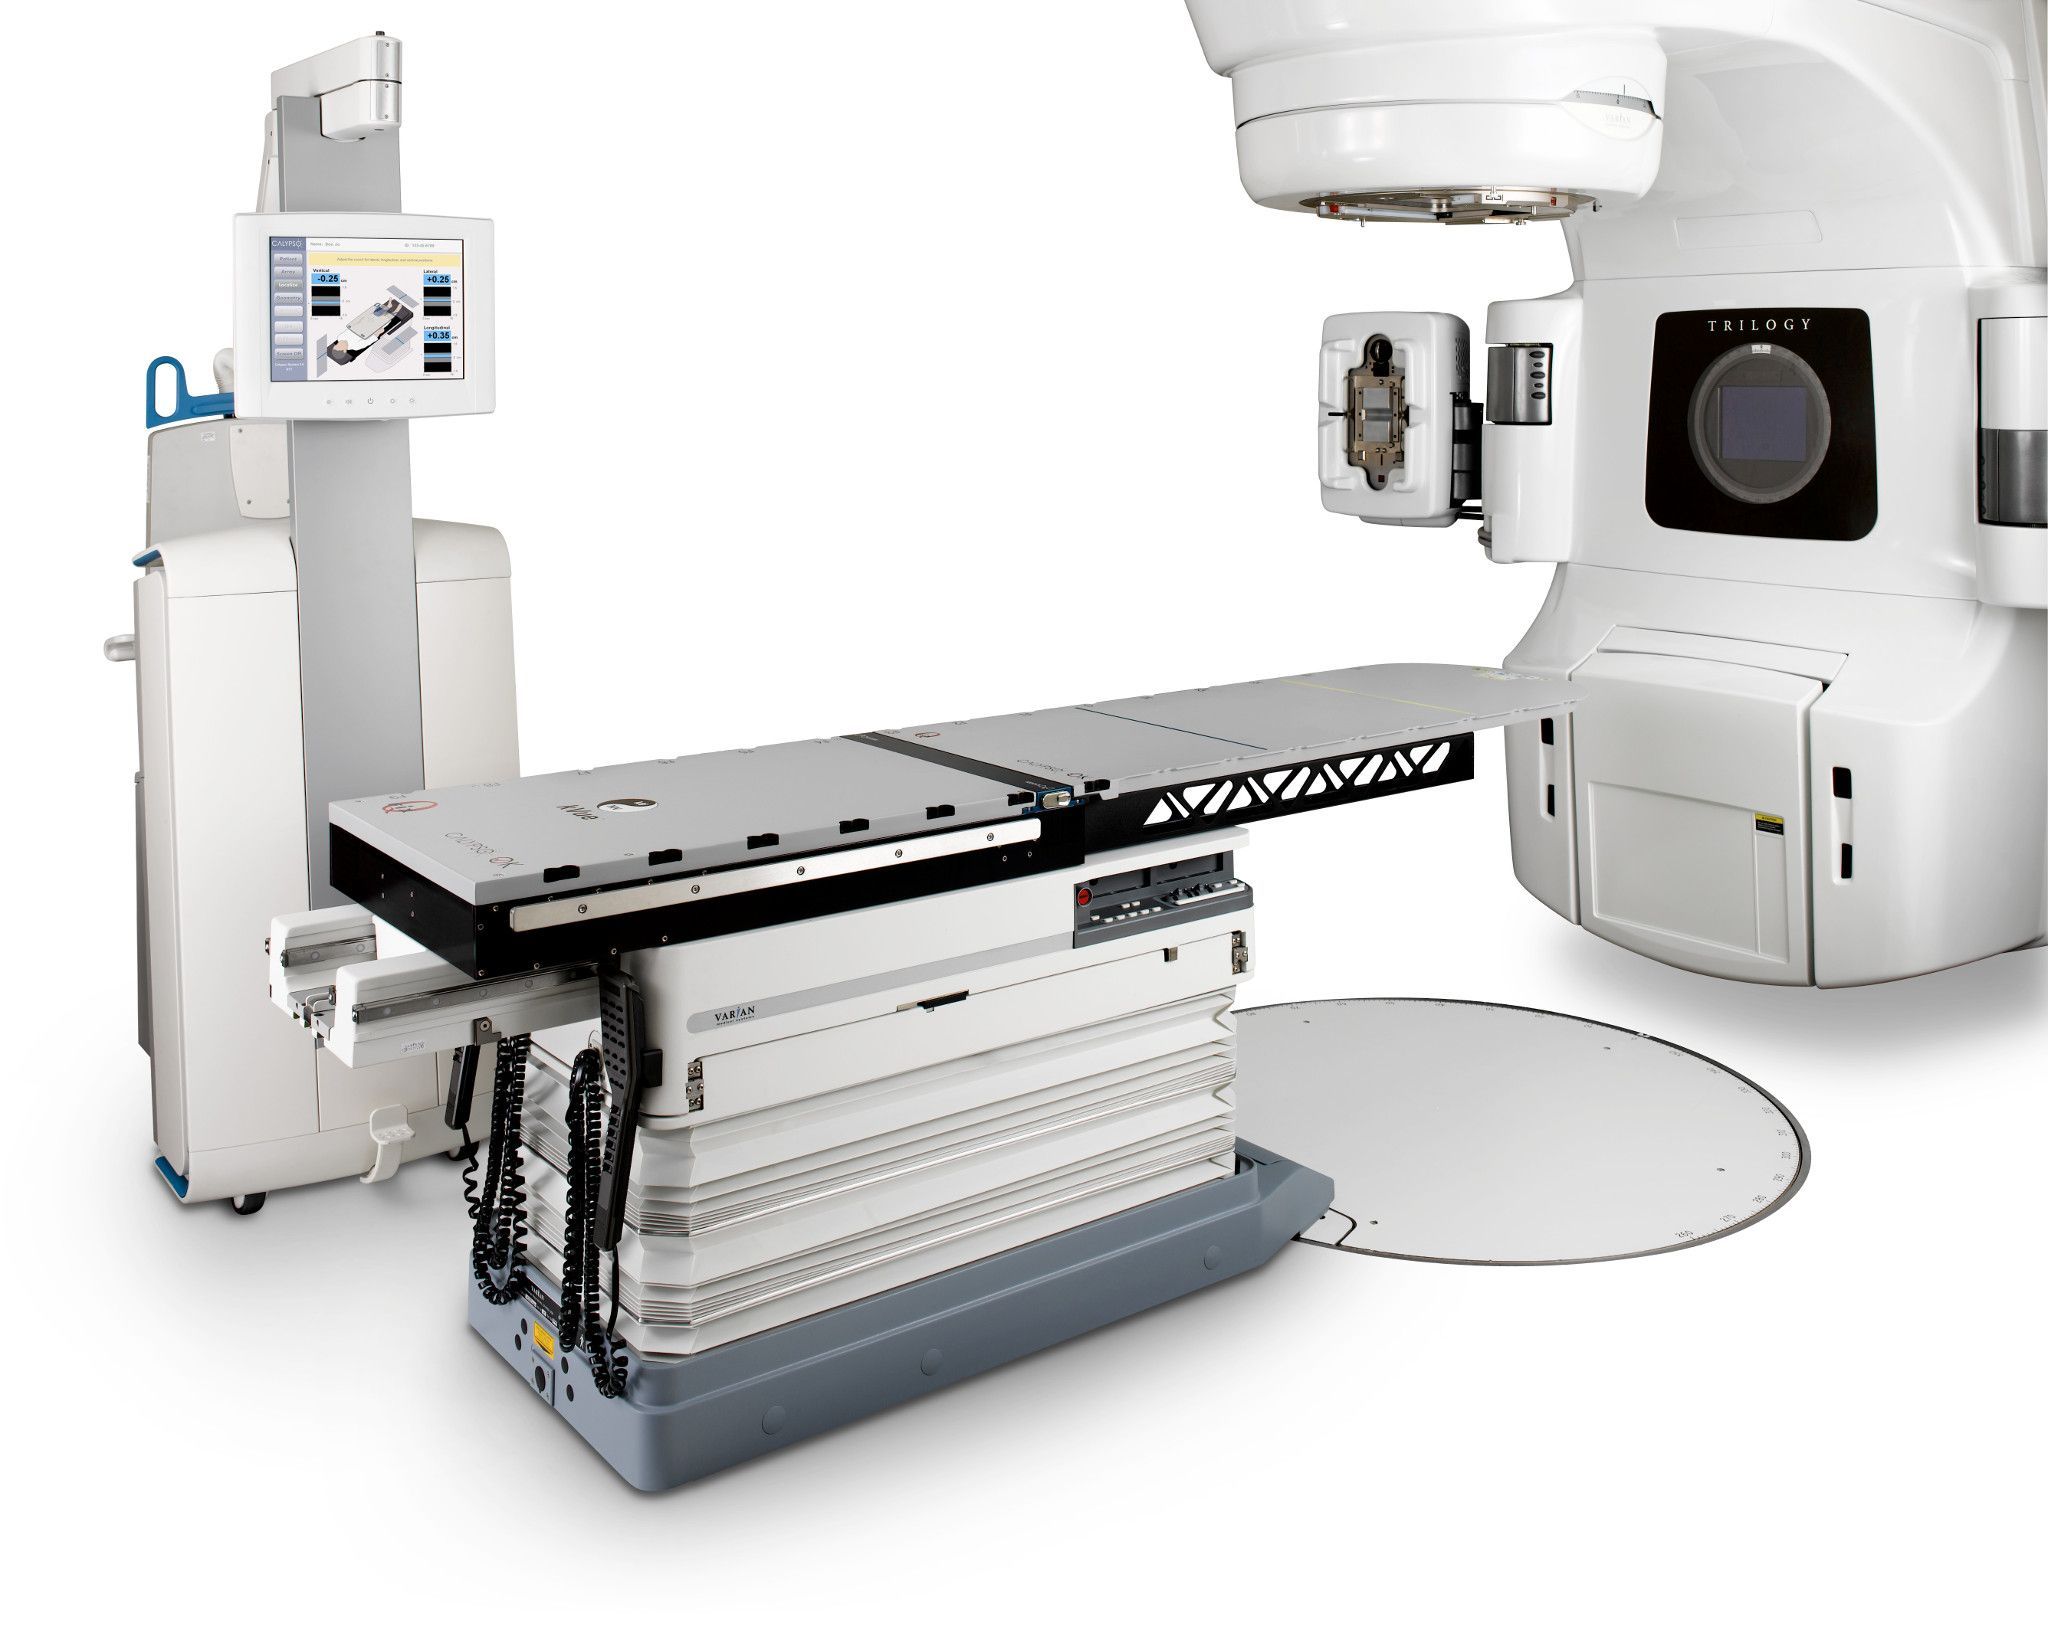 Varian's Calypso system for tracking tumor motion